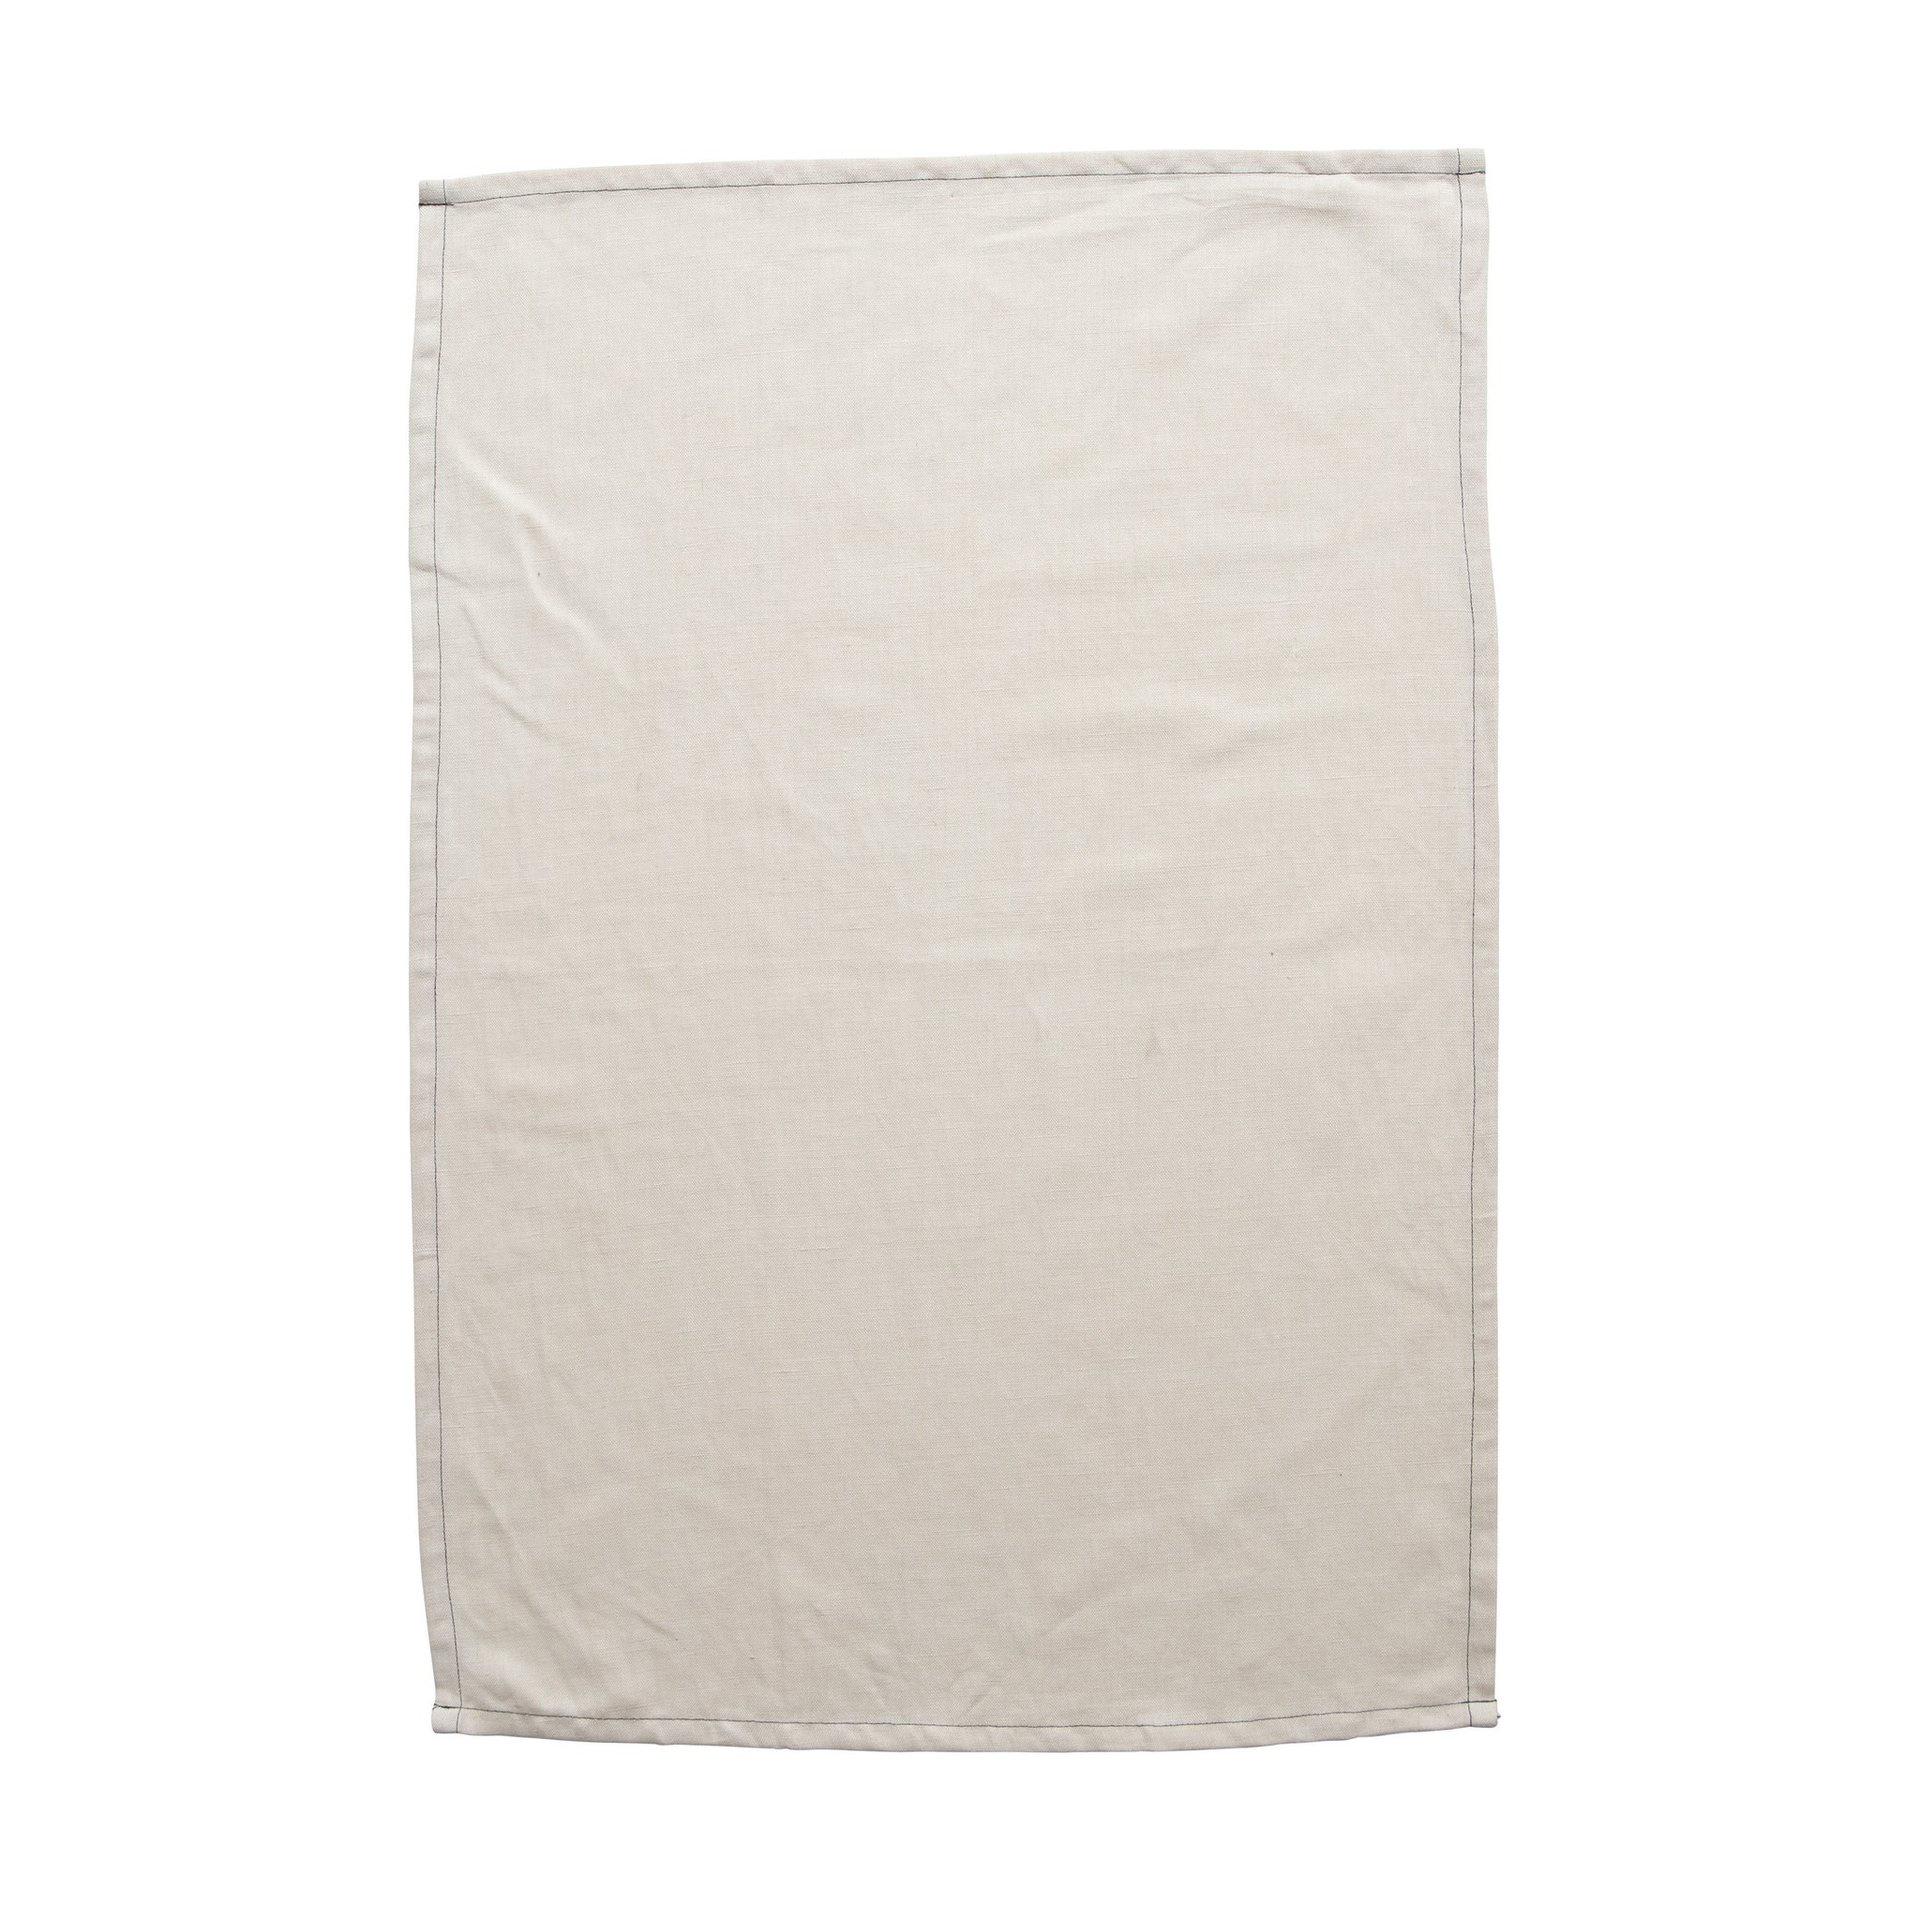 Milk & Sugar Blush Tea Towel